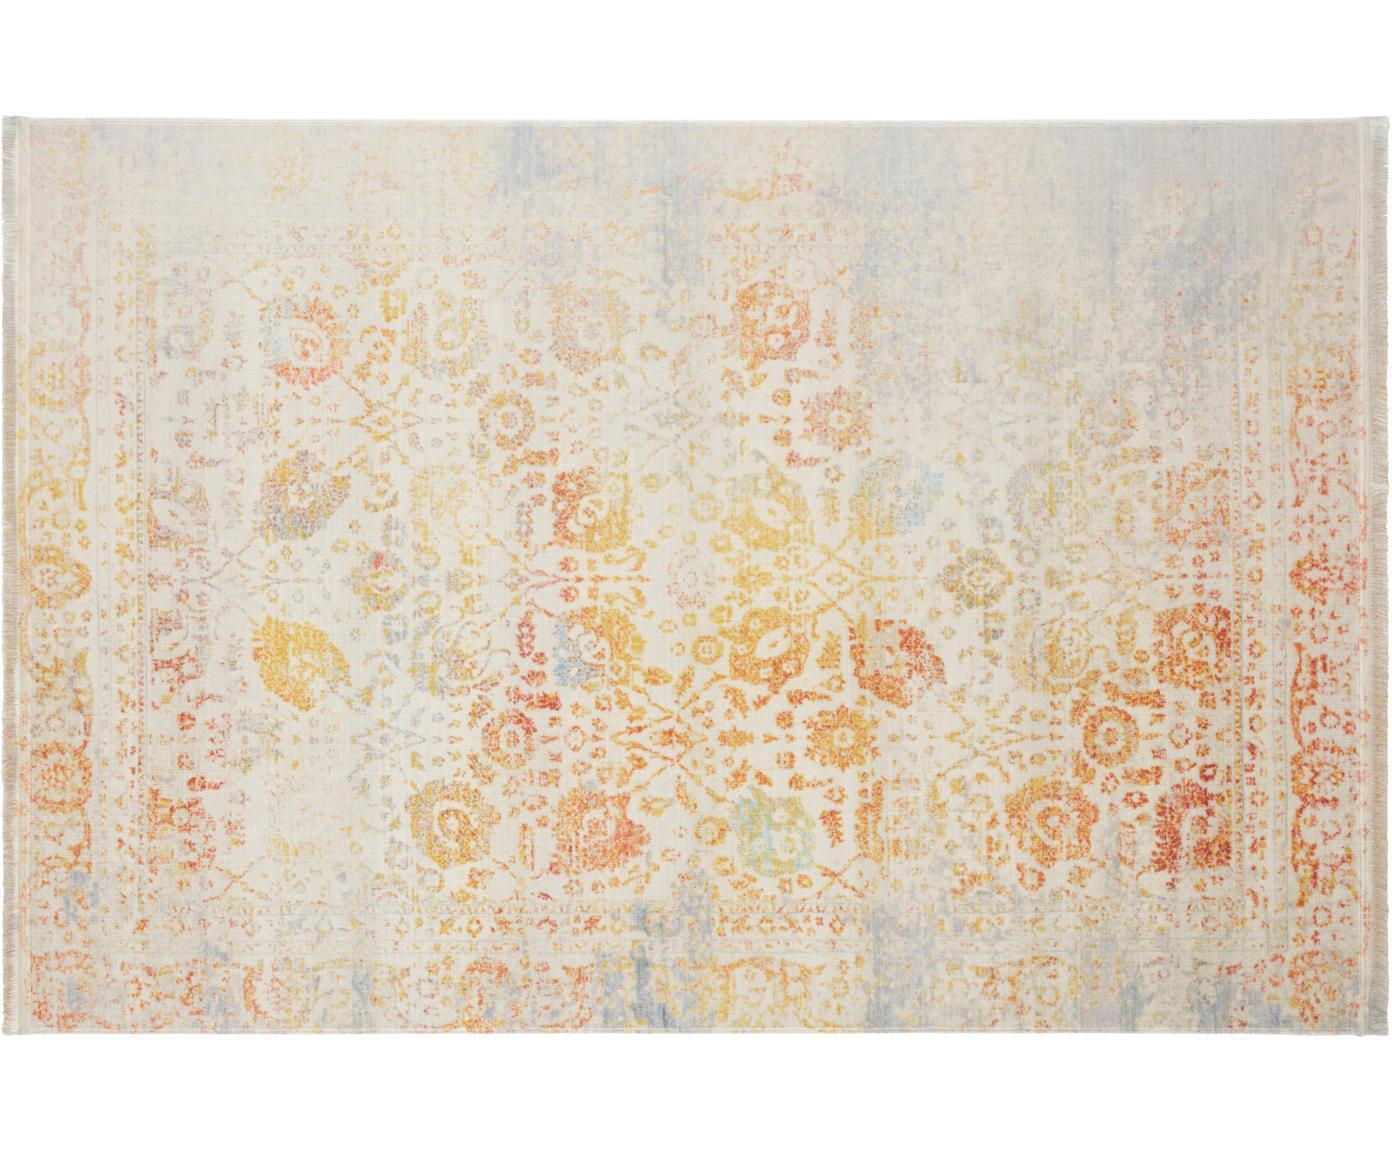 Dywan vintage Menga, Wielobarwny, S 120 x D 180 cm (Rozmiar S)